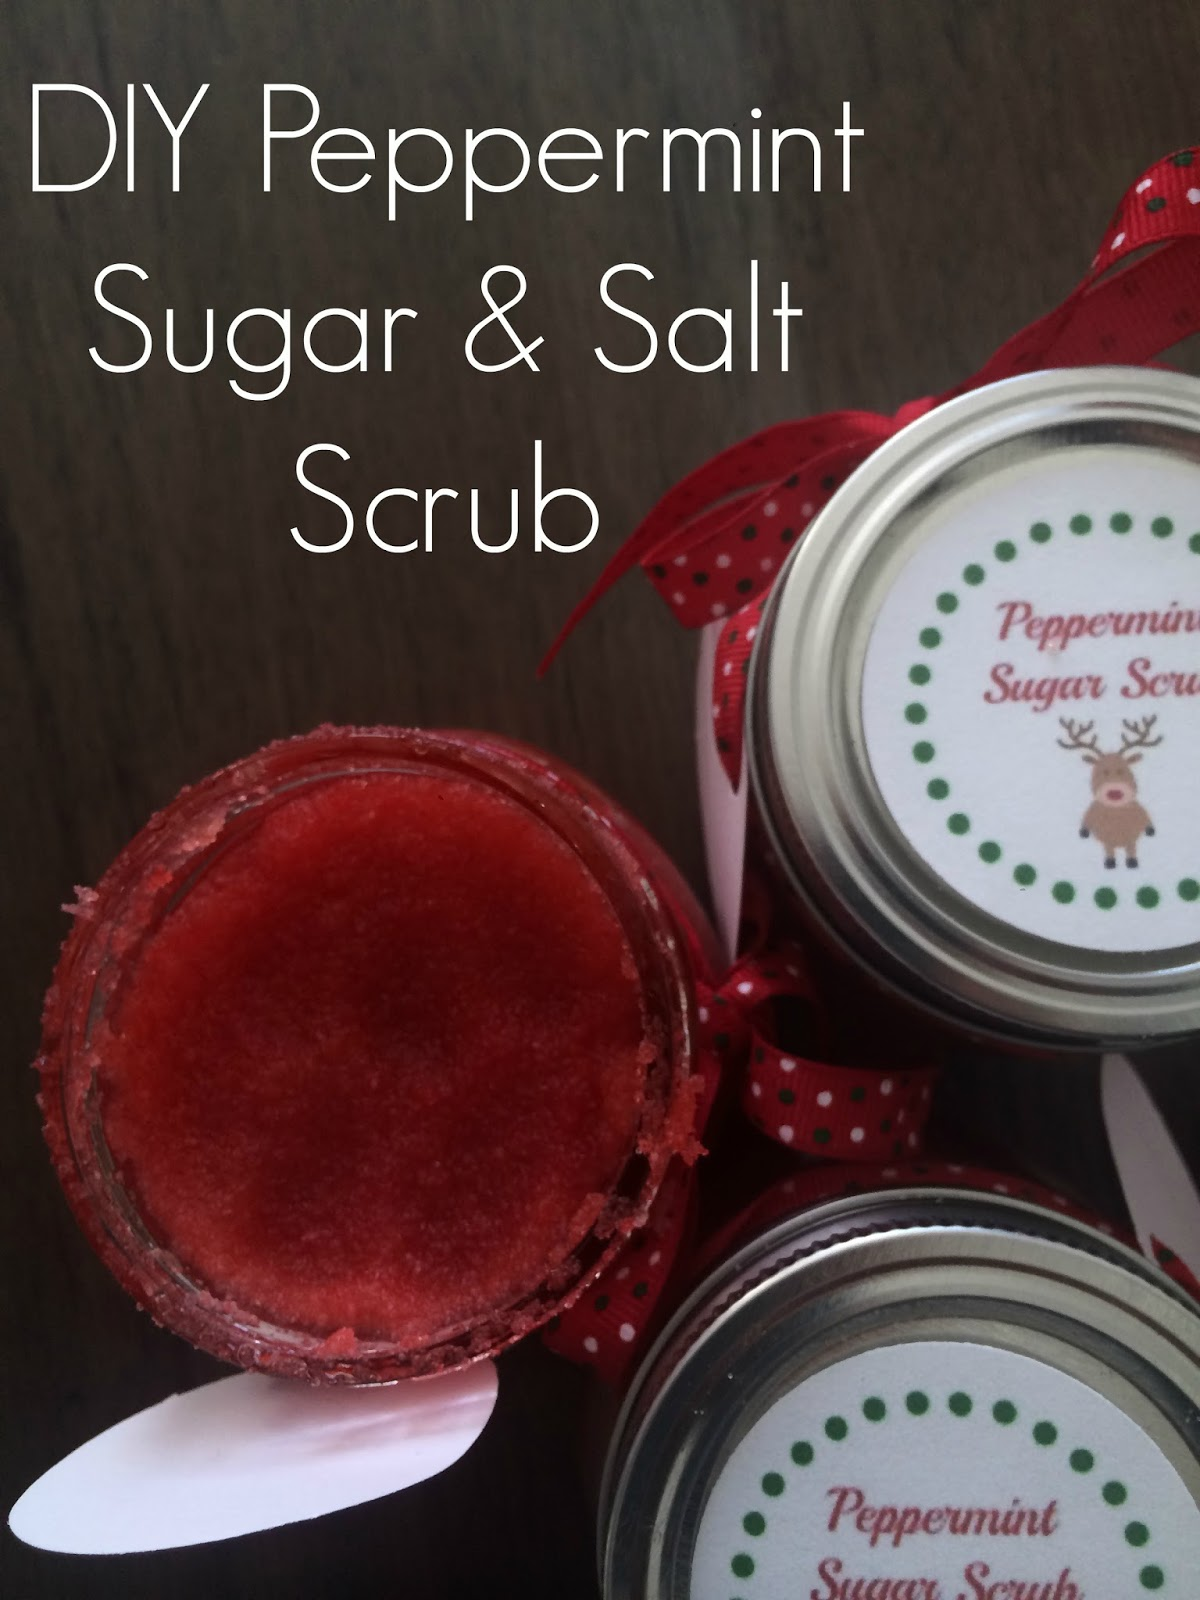 Diy Peppermint Sugar Salt Scrub The Chirping Moms